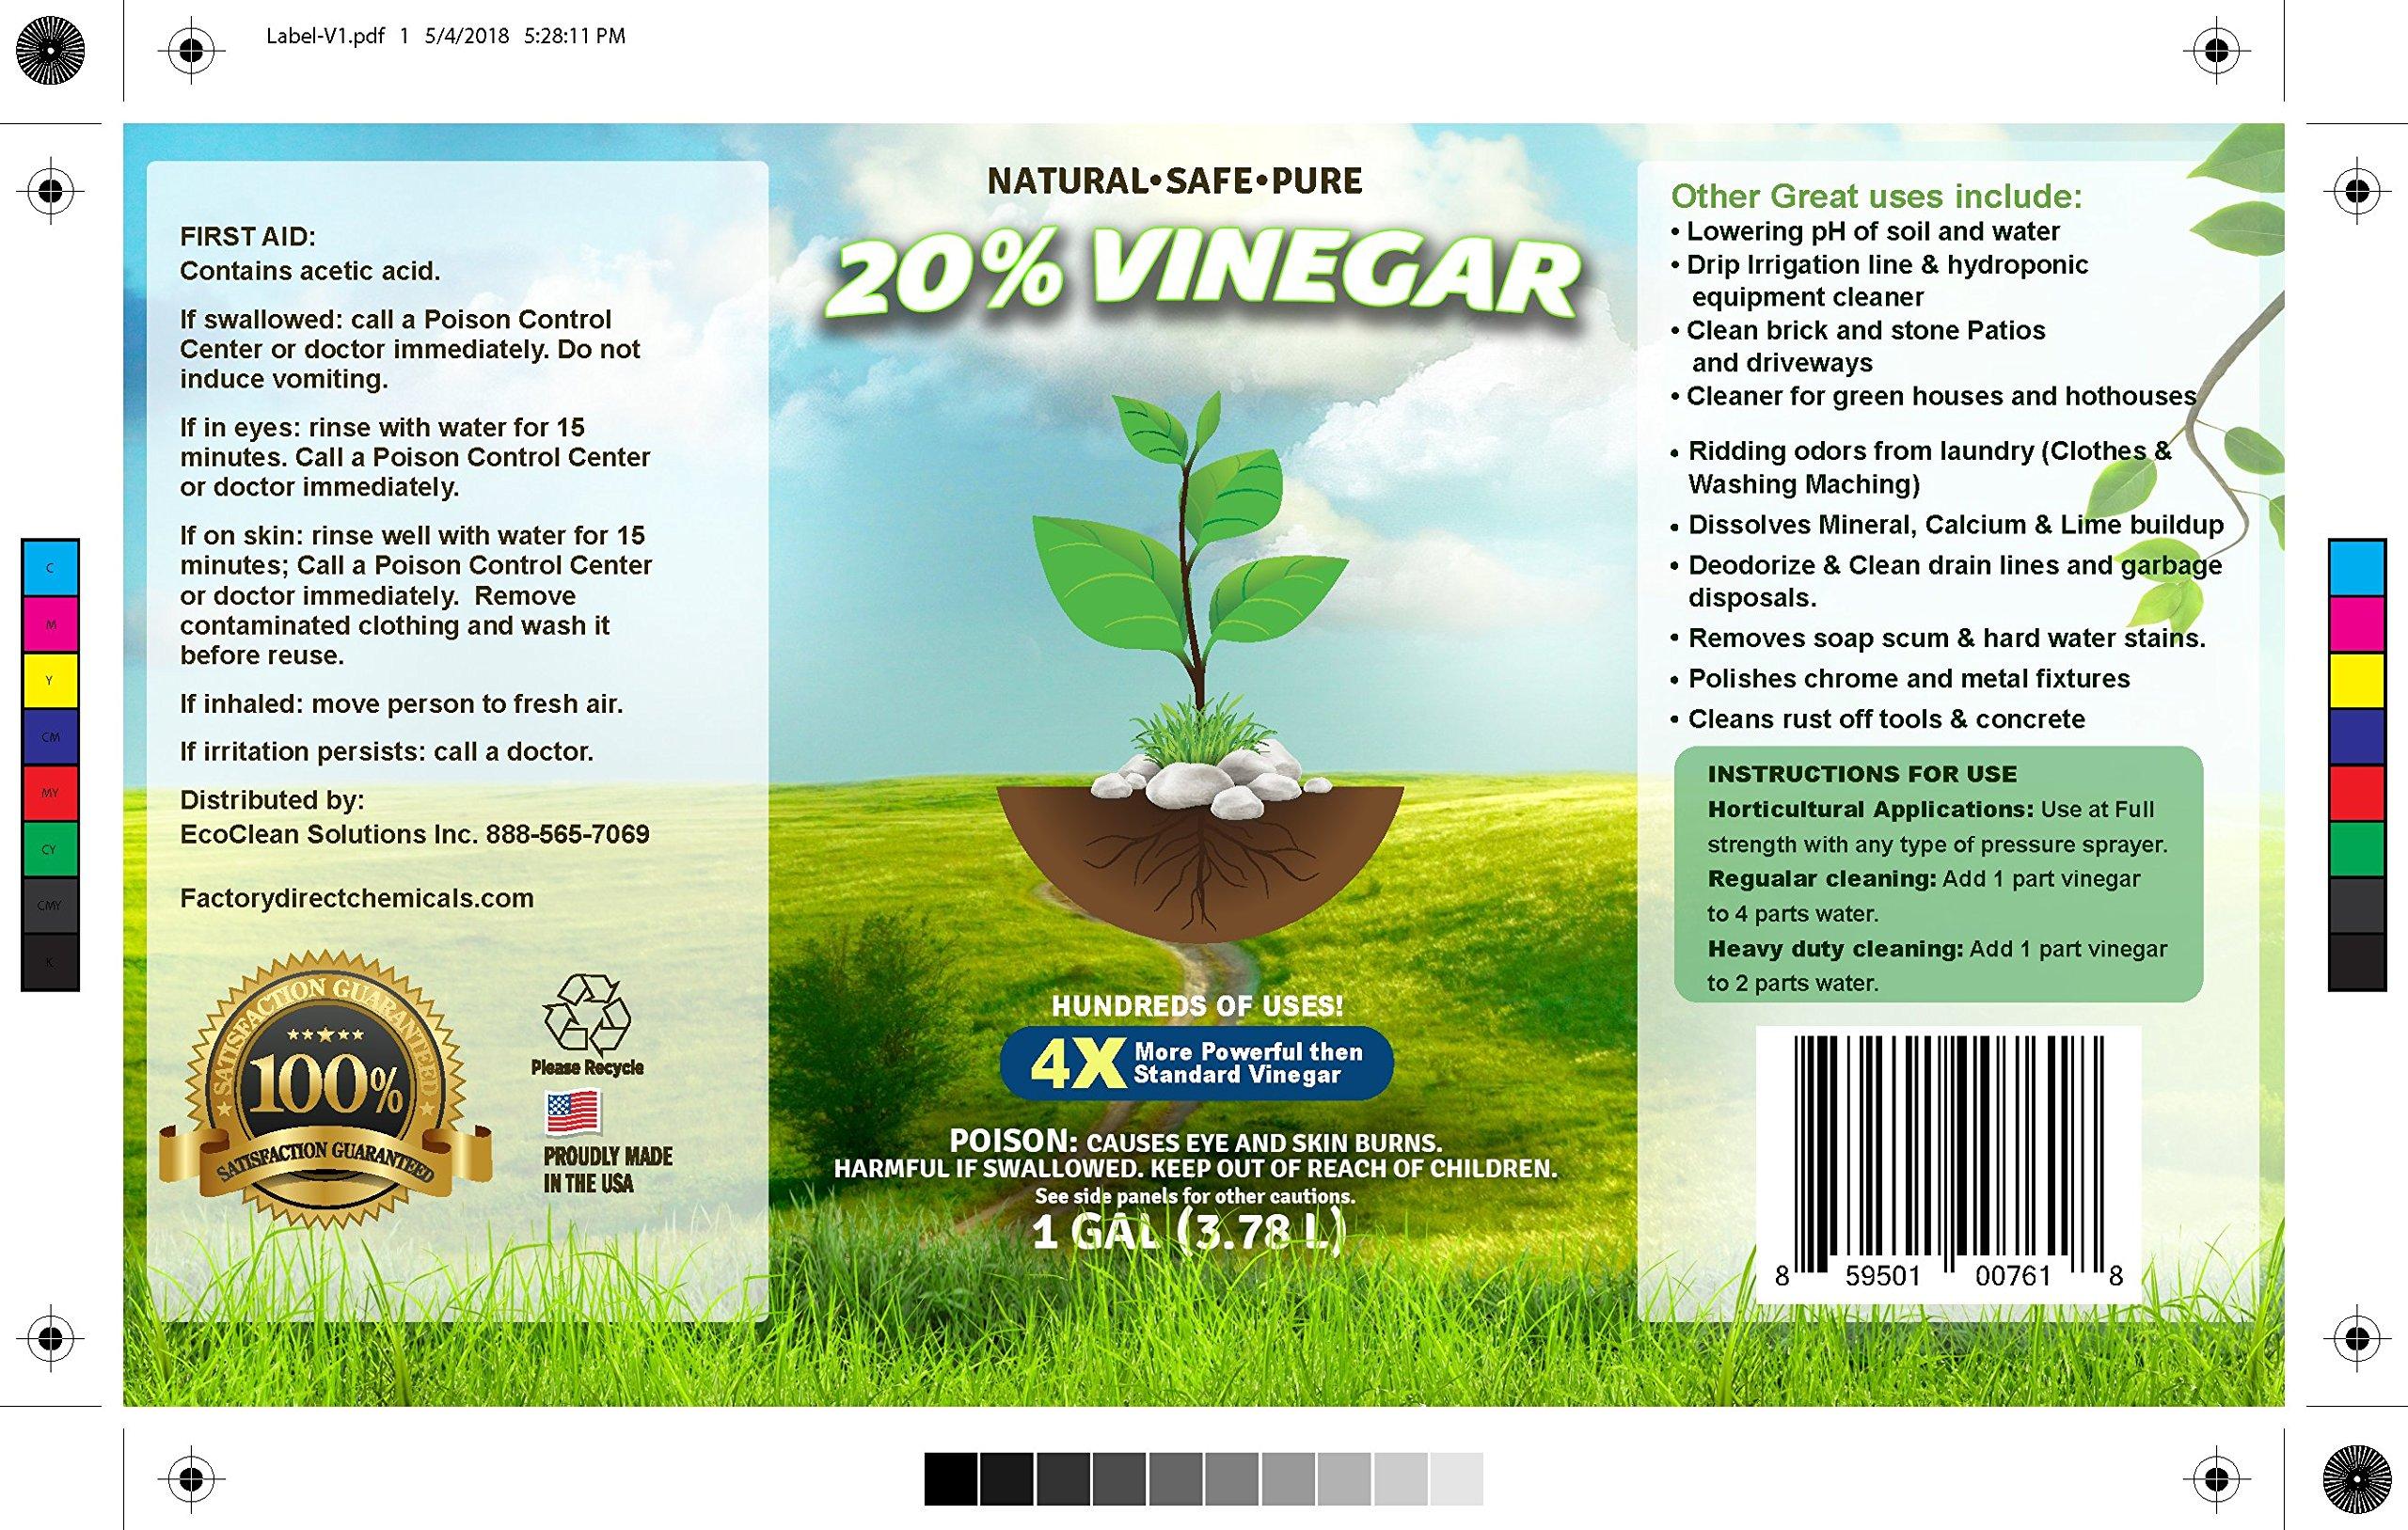 20% Vinegar | Industrial Strength Natural Vinegar | Multi Purpose - 5 Gallon Pail by Green Gobbler (Image #2)